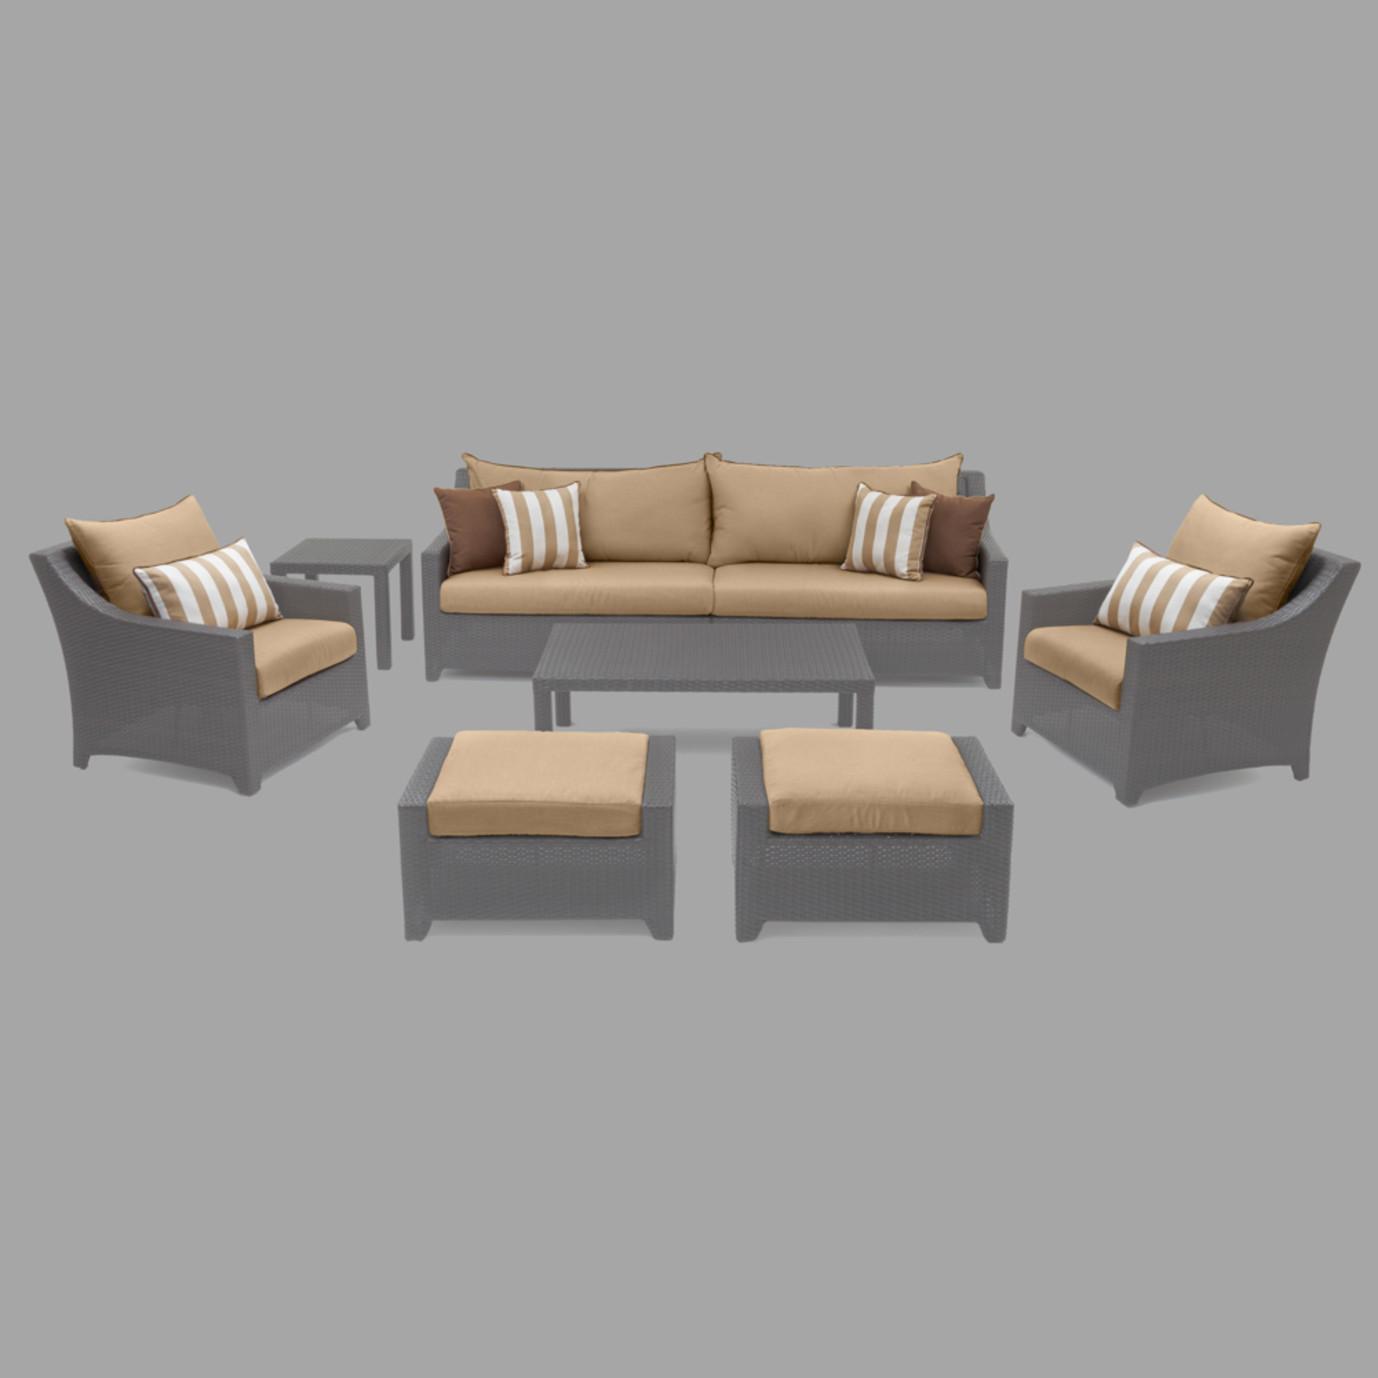 Modular Outdoor 8 Piece Club Cushion Cover Set - Maxim Beige